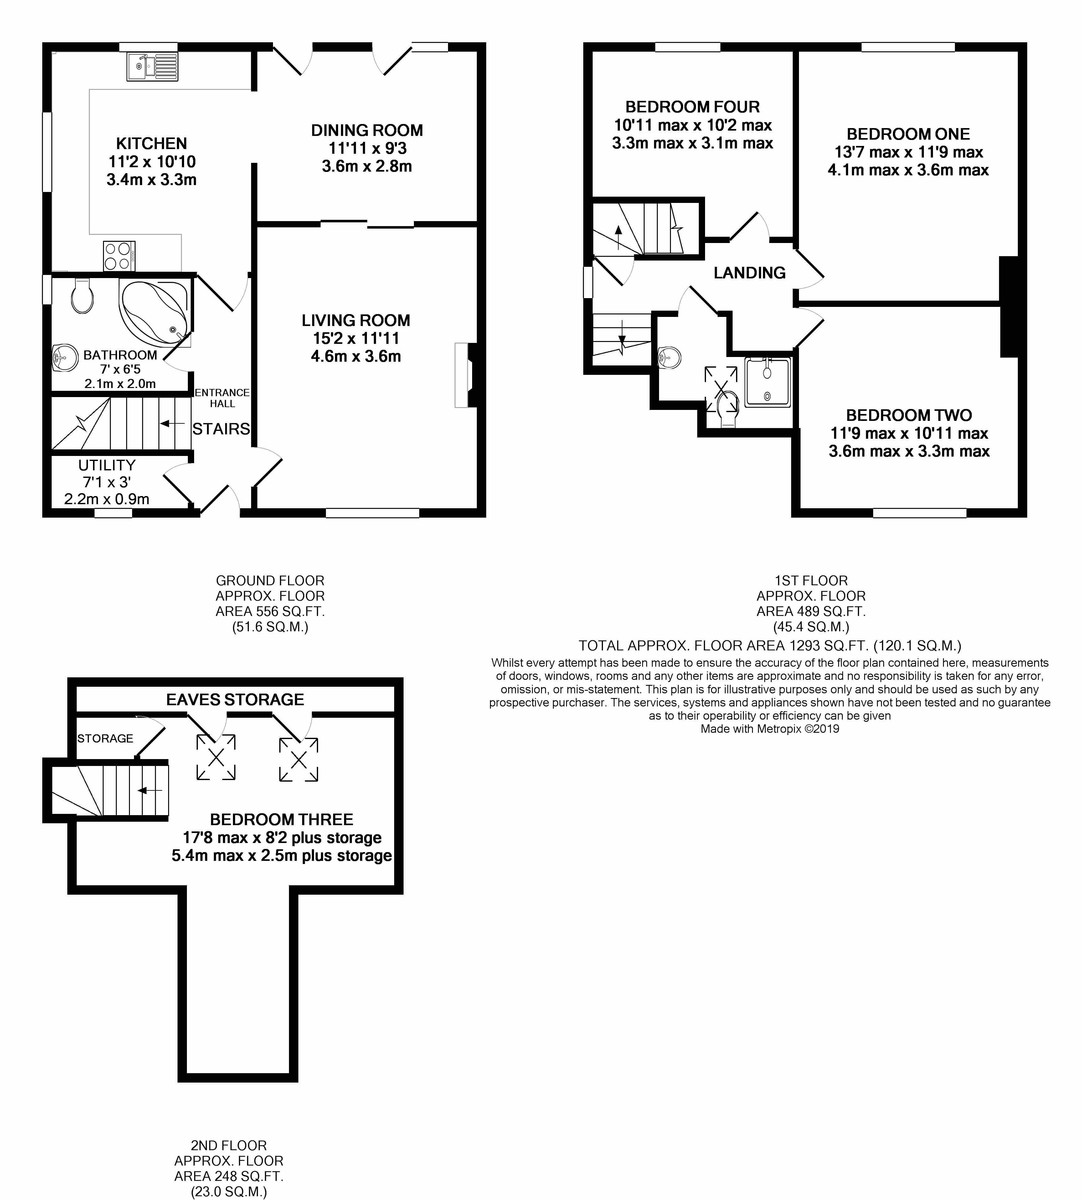 Carless Avenue, Harborne floorplan 1 of 1